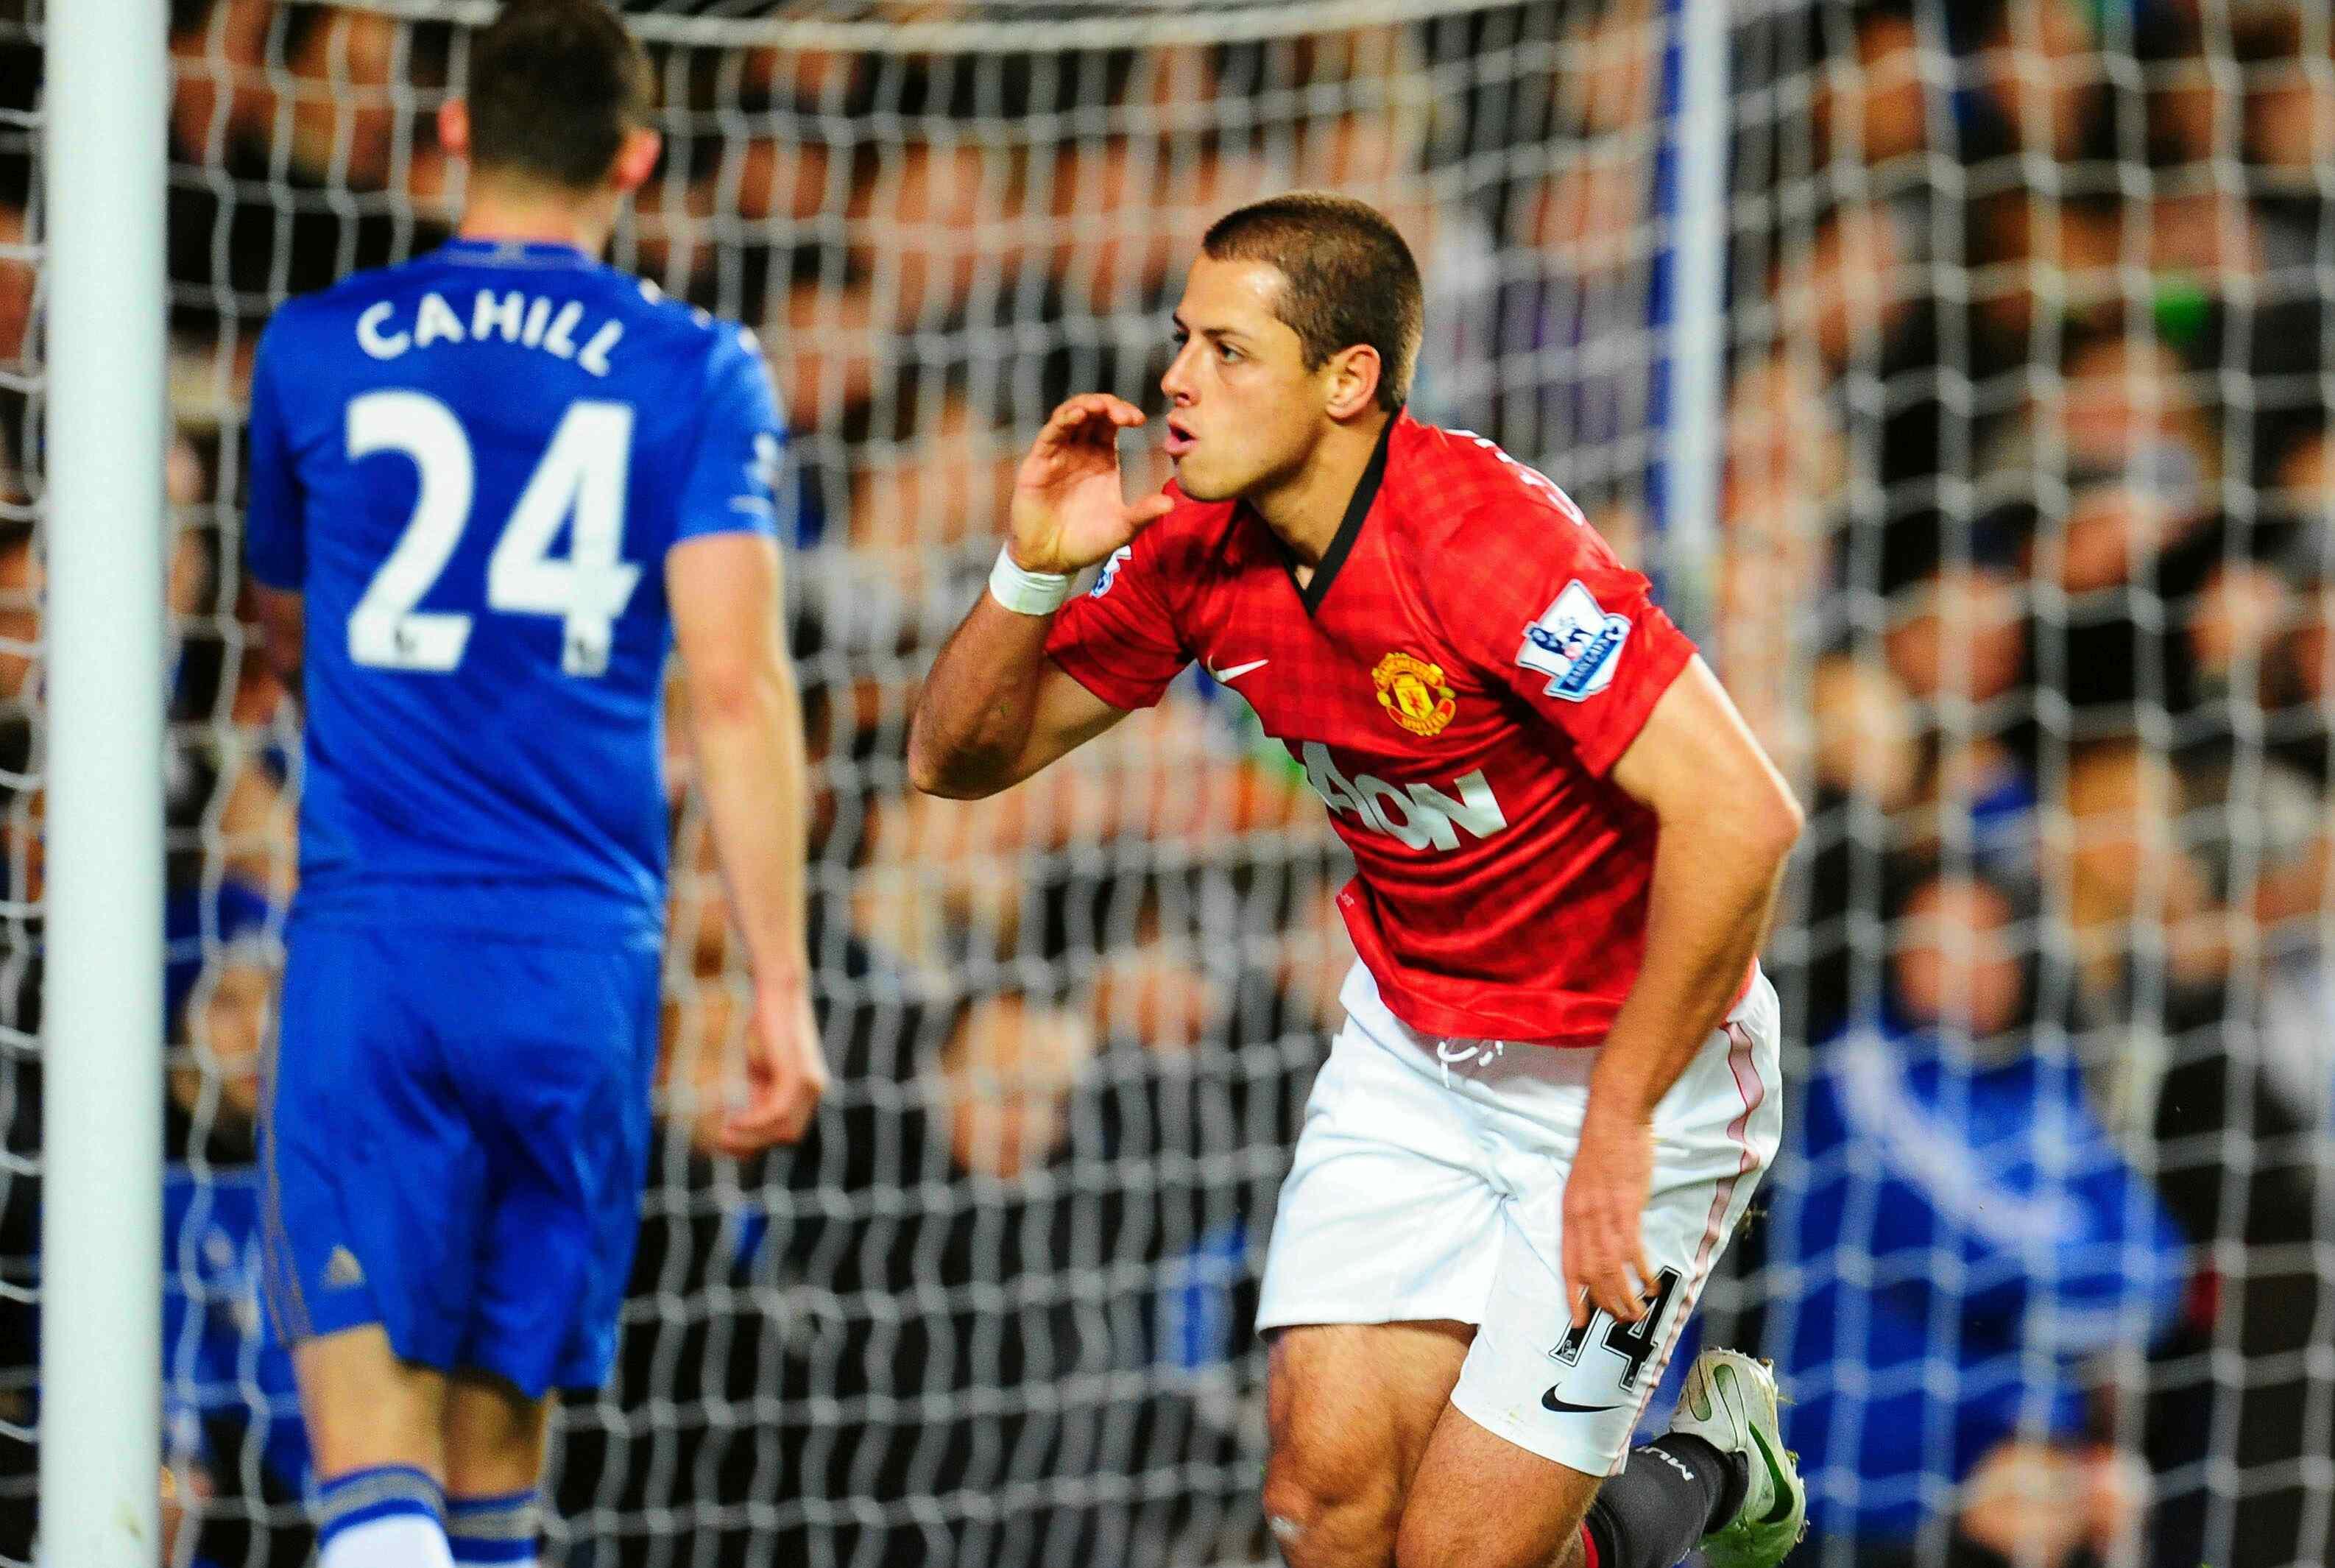 Mourinho busca el retorno de Chicharito al United — Prensa